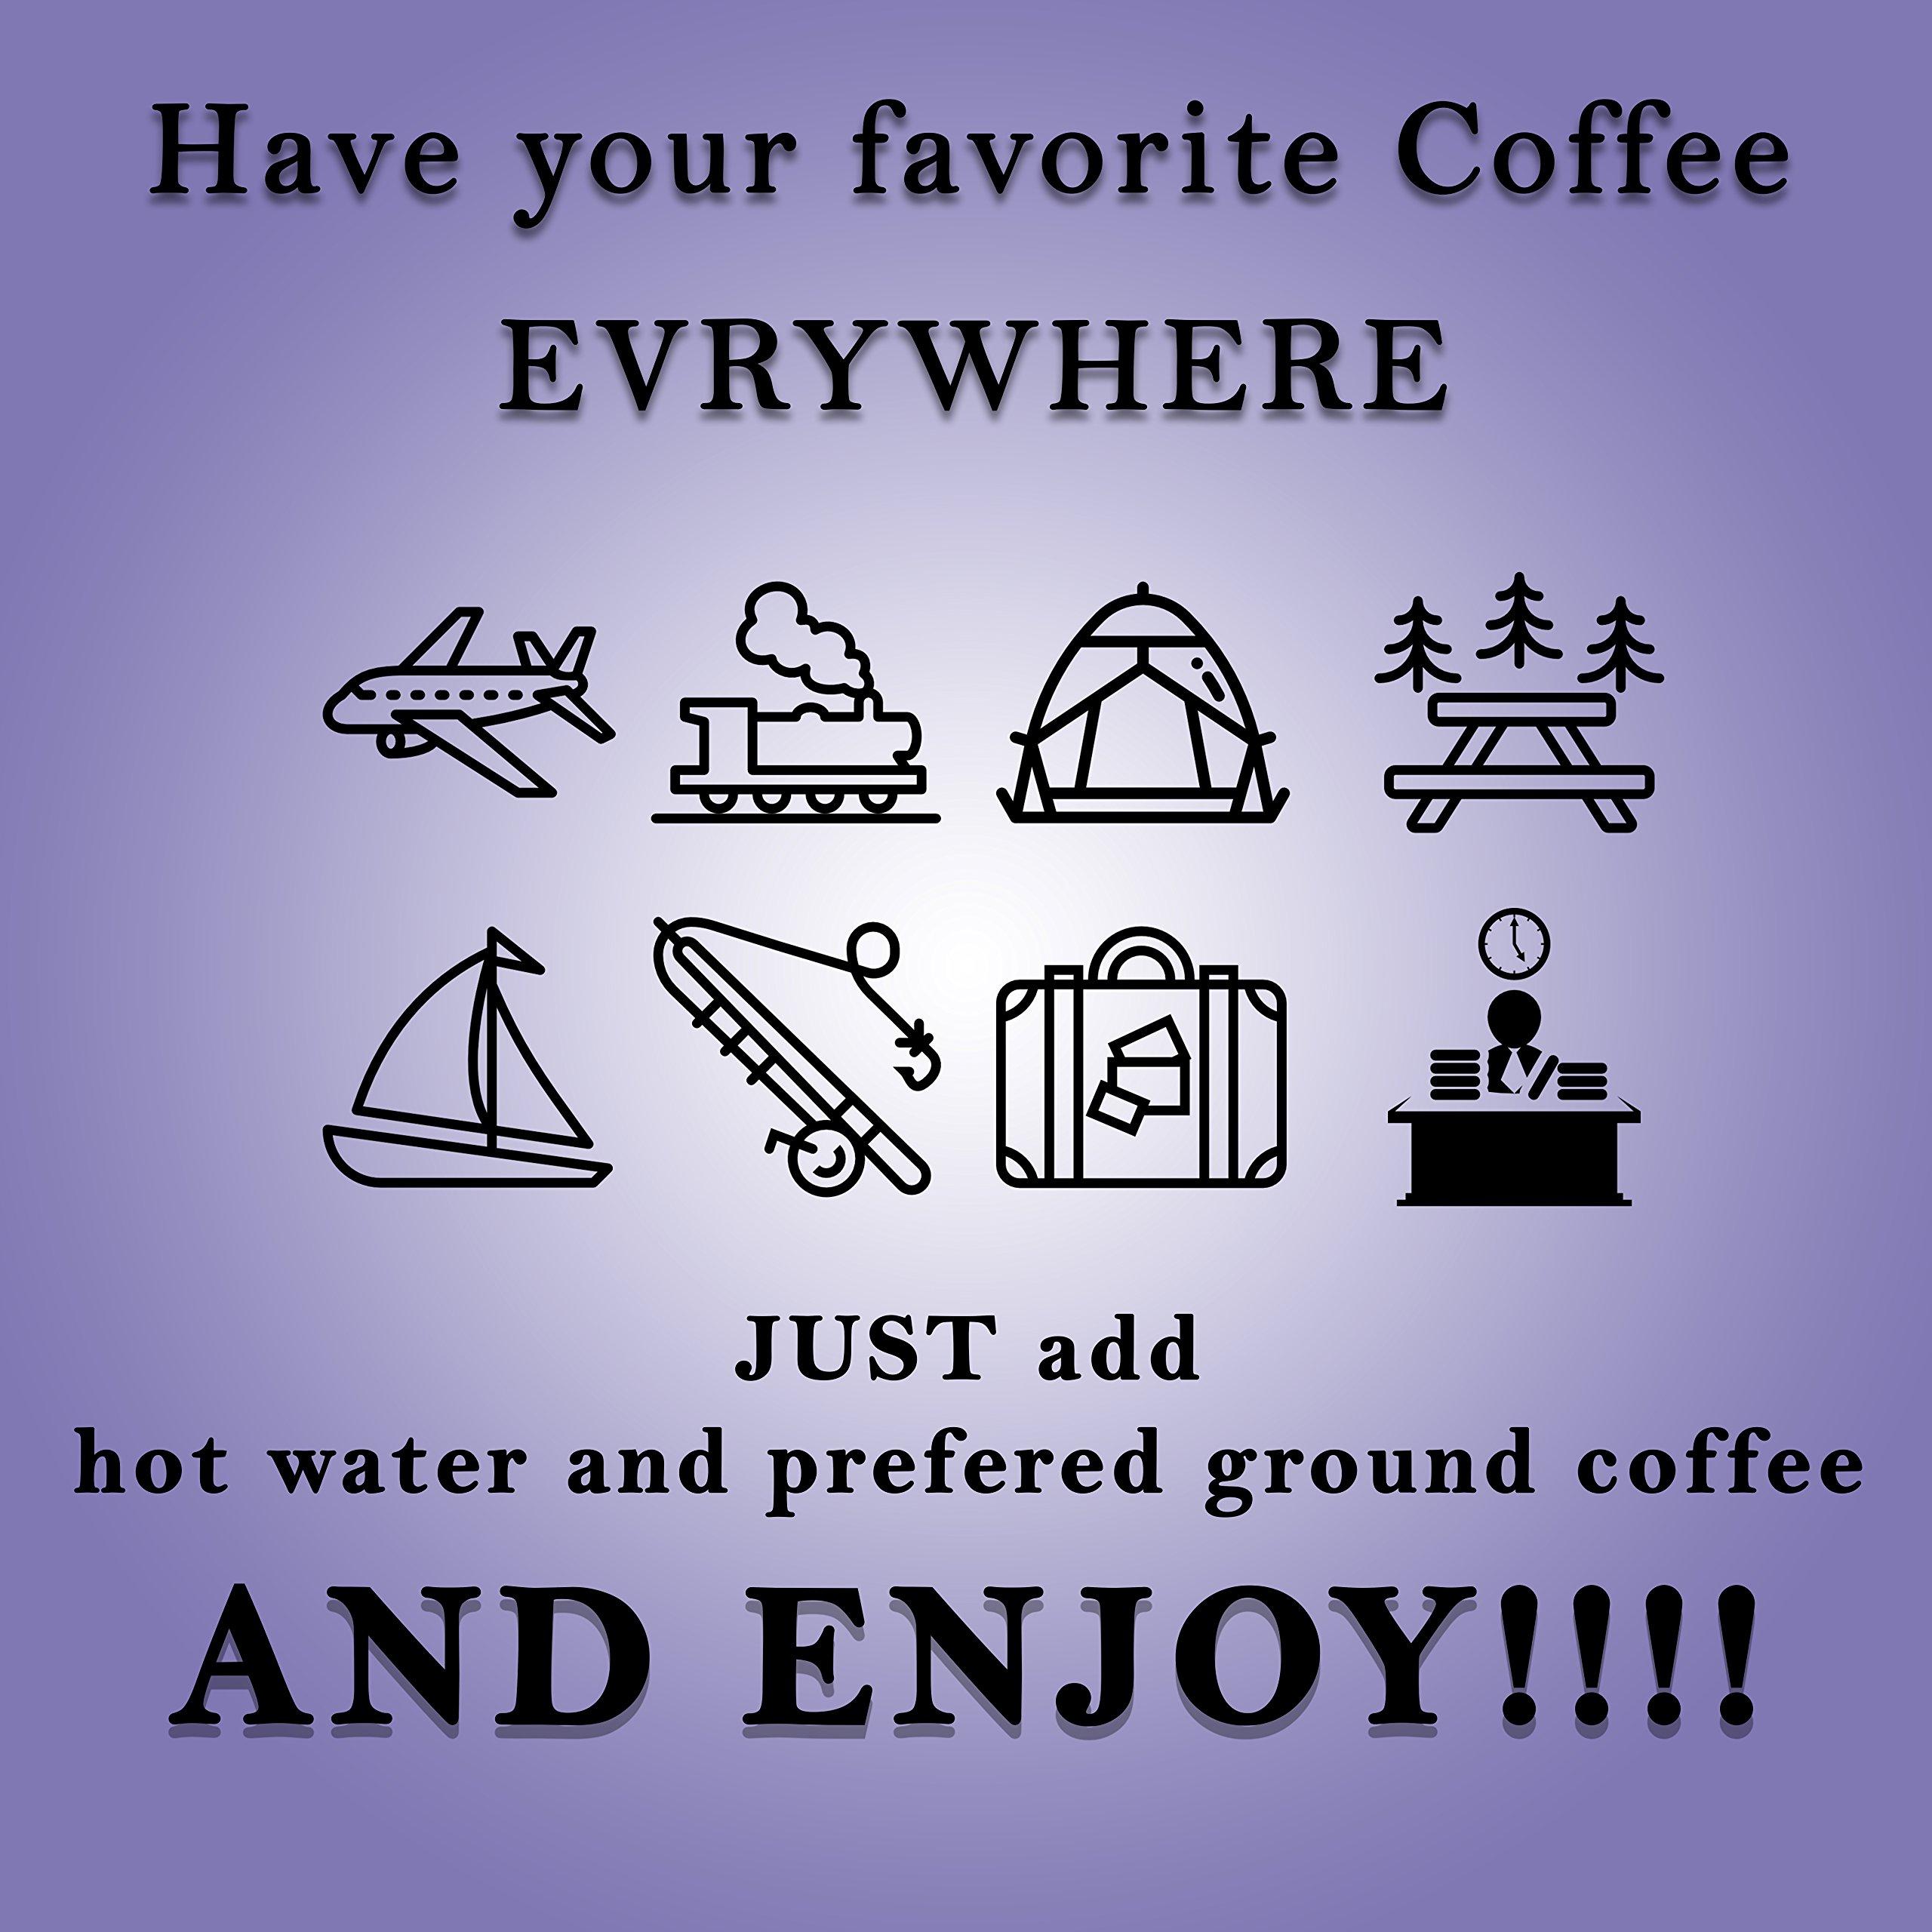 ☕️ Mini Espresso Maker + BONUS! ☕️ Portable Black Compact Manual Coffee Maker, Hand Operated Non-Electric Machine for ESPRESSO ☕️. BONUSES Container for ground coffee ☕️ & Elegant Carry Bag by NH-Kitchen (Image #2)